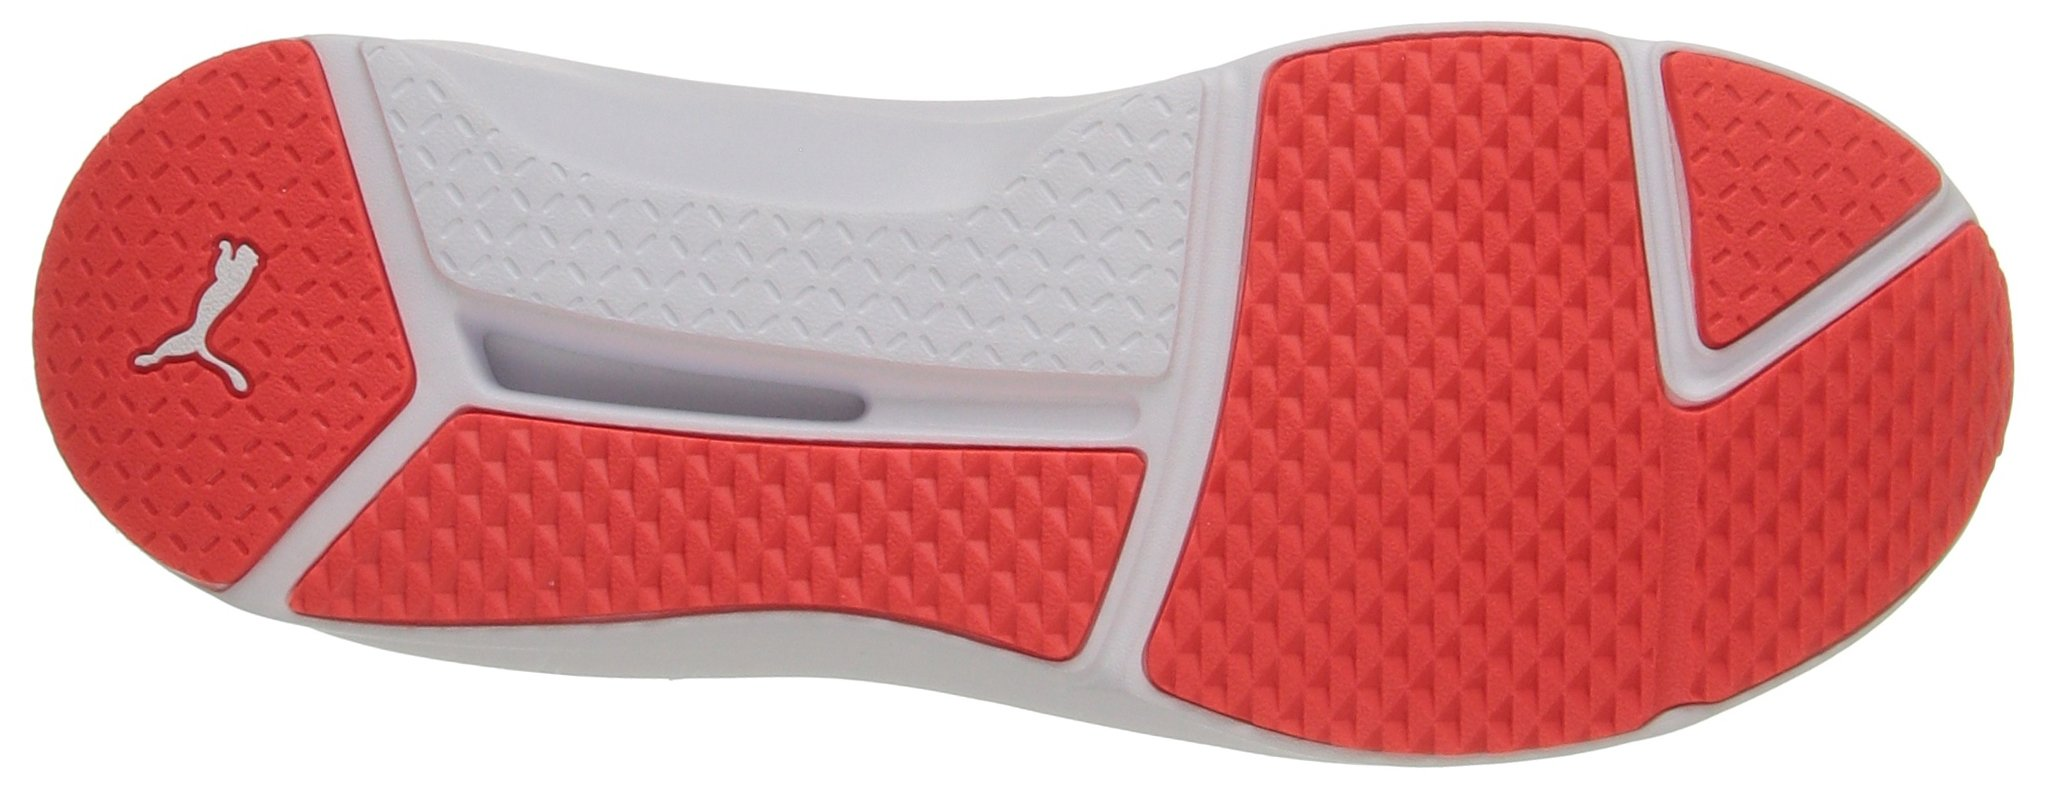 PUMA Women's Fierce Eng Mesh Cross-Trainer Shoe, Red Blast White, 5.5 M US by PUMA (Image #3)